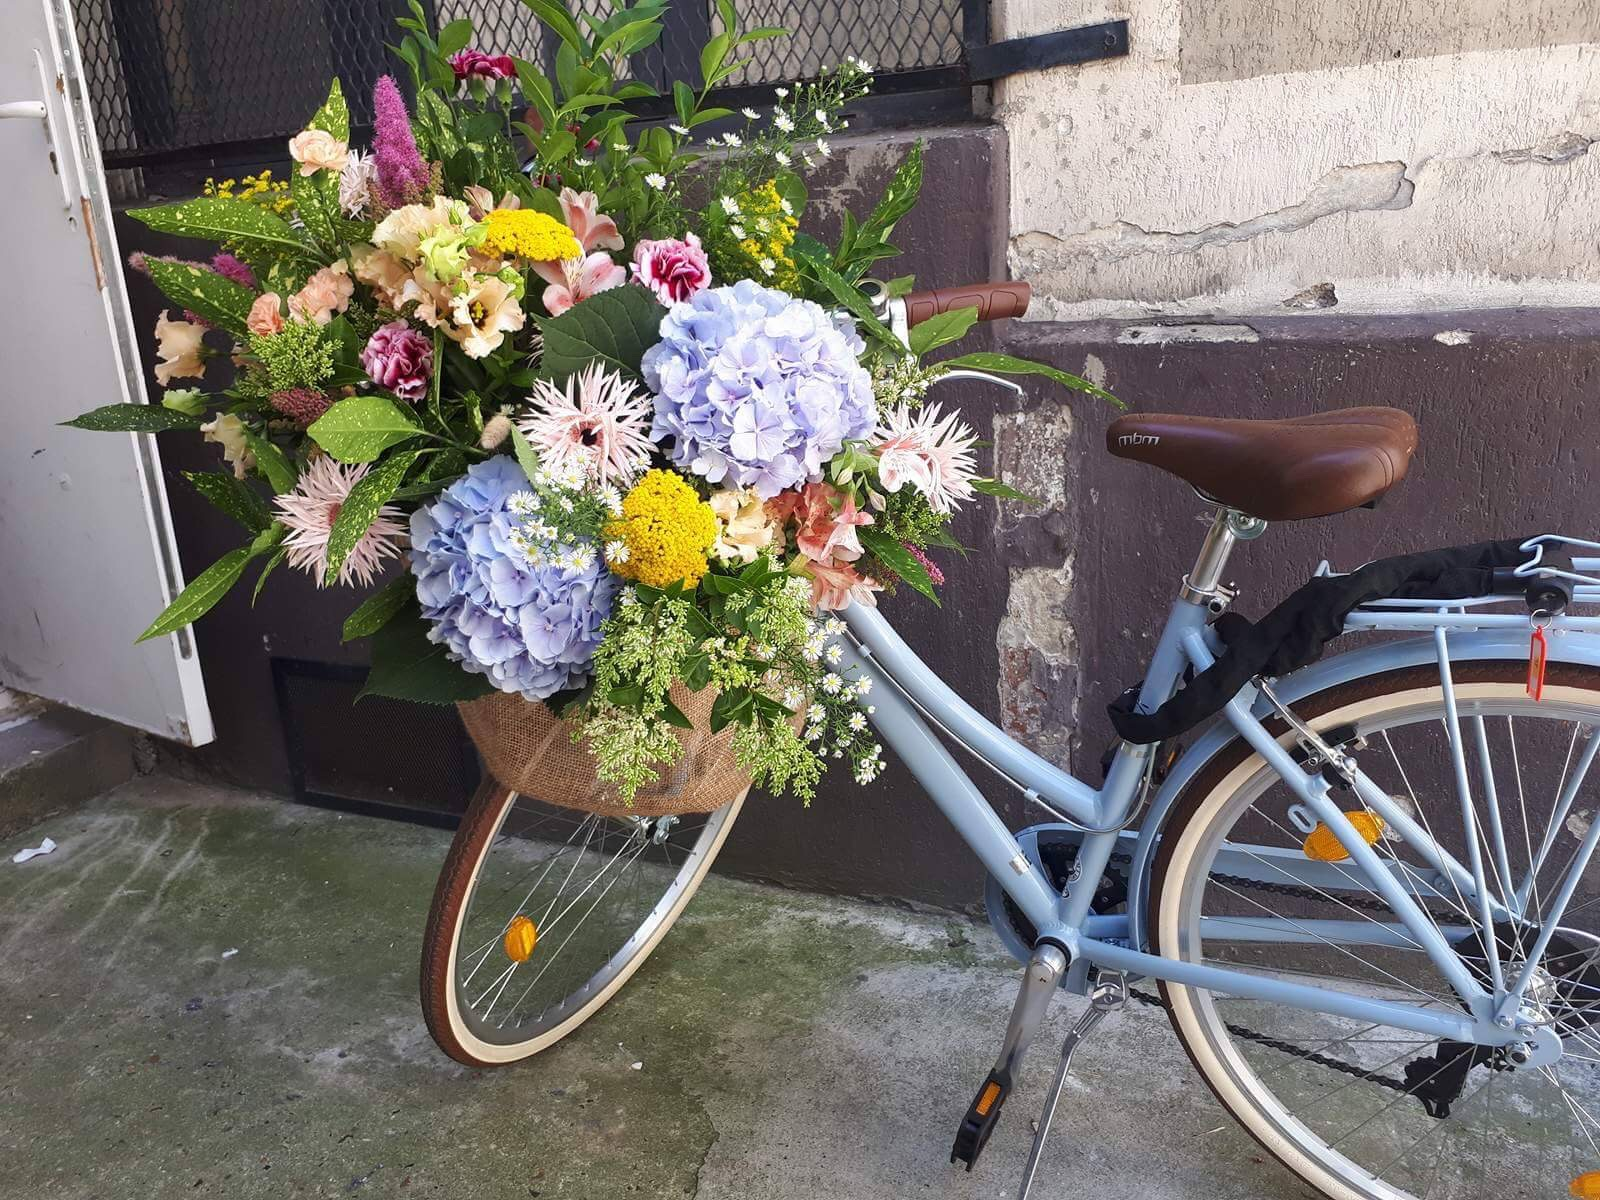 velo_fleurs_paris.jpeg